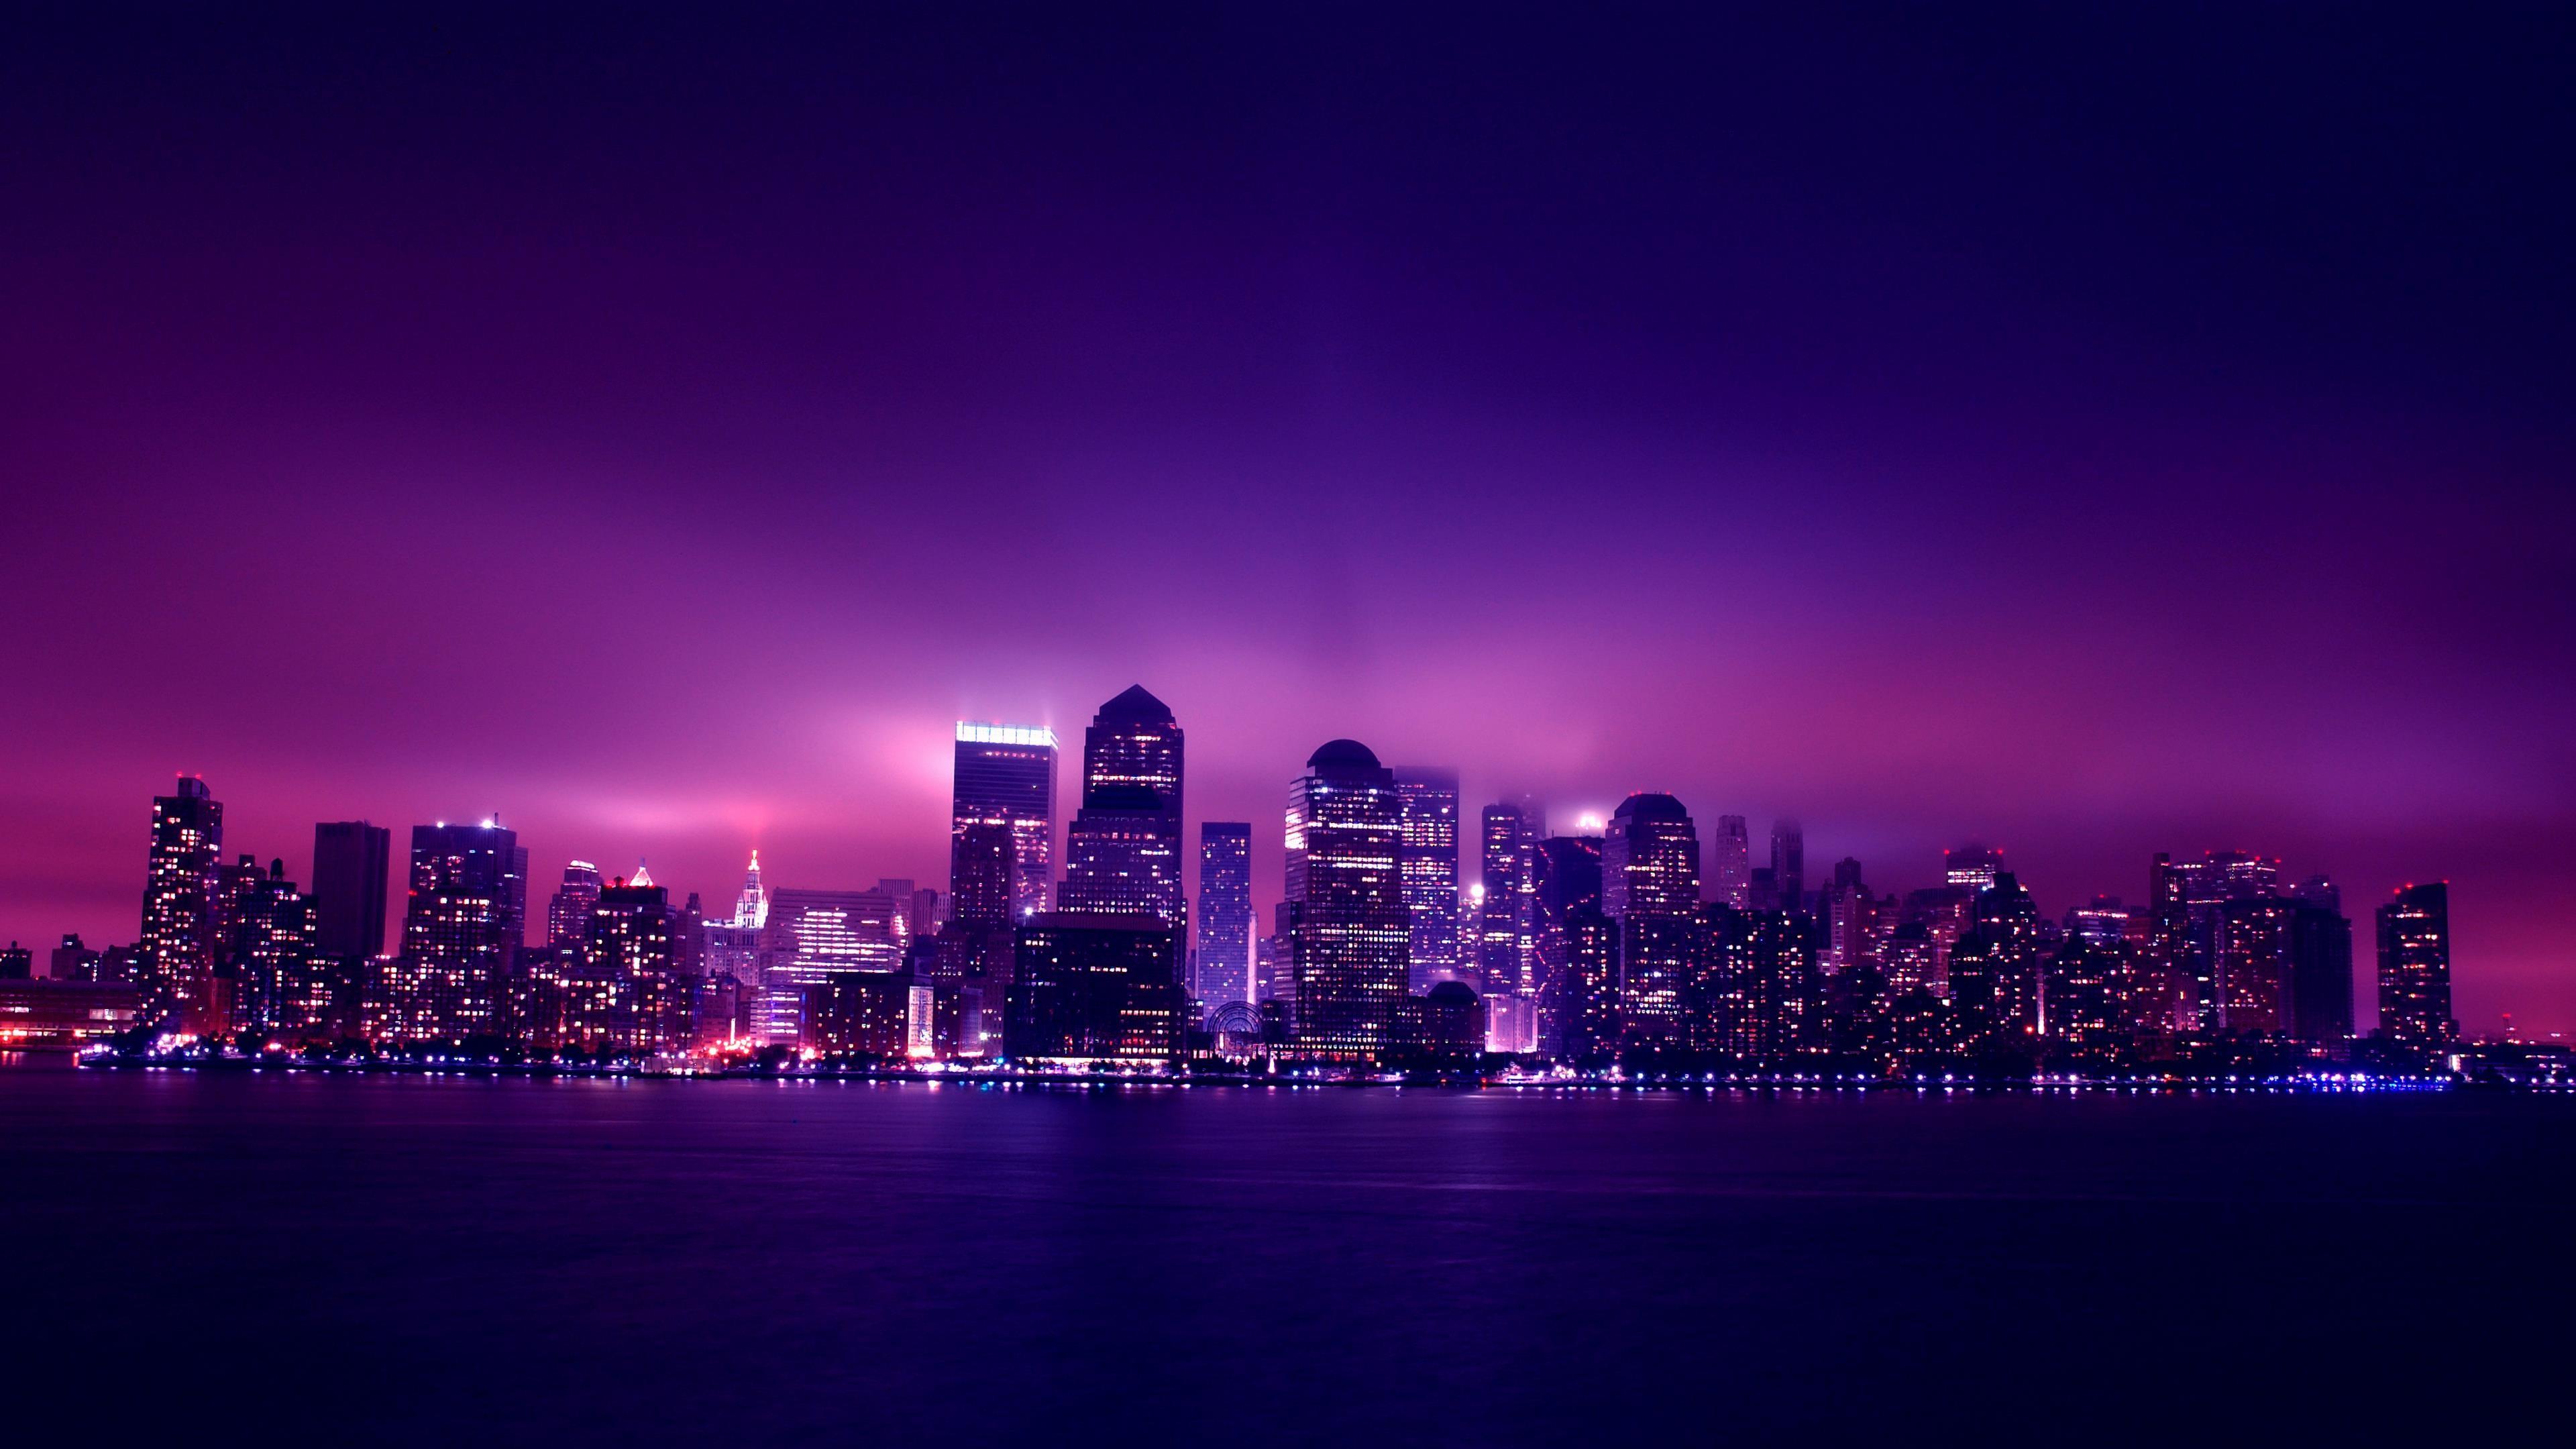 4k purple wallpapers high quality download free for Sfondi hd viola